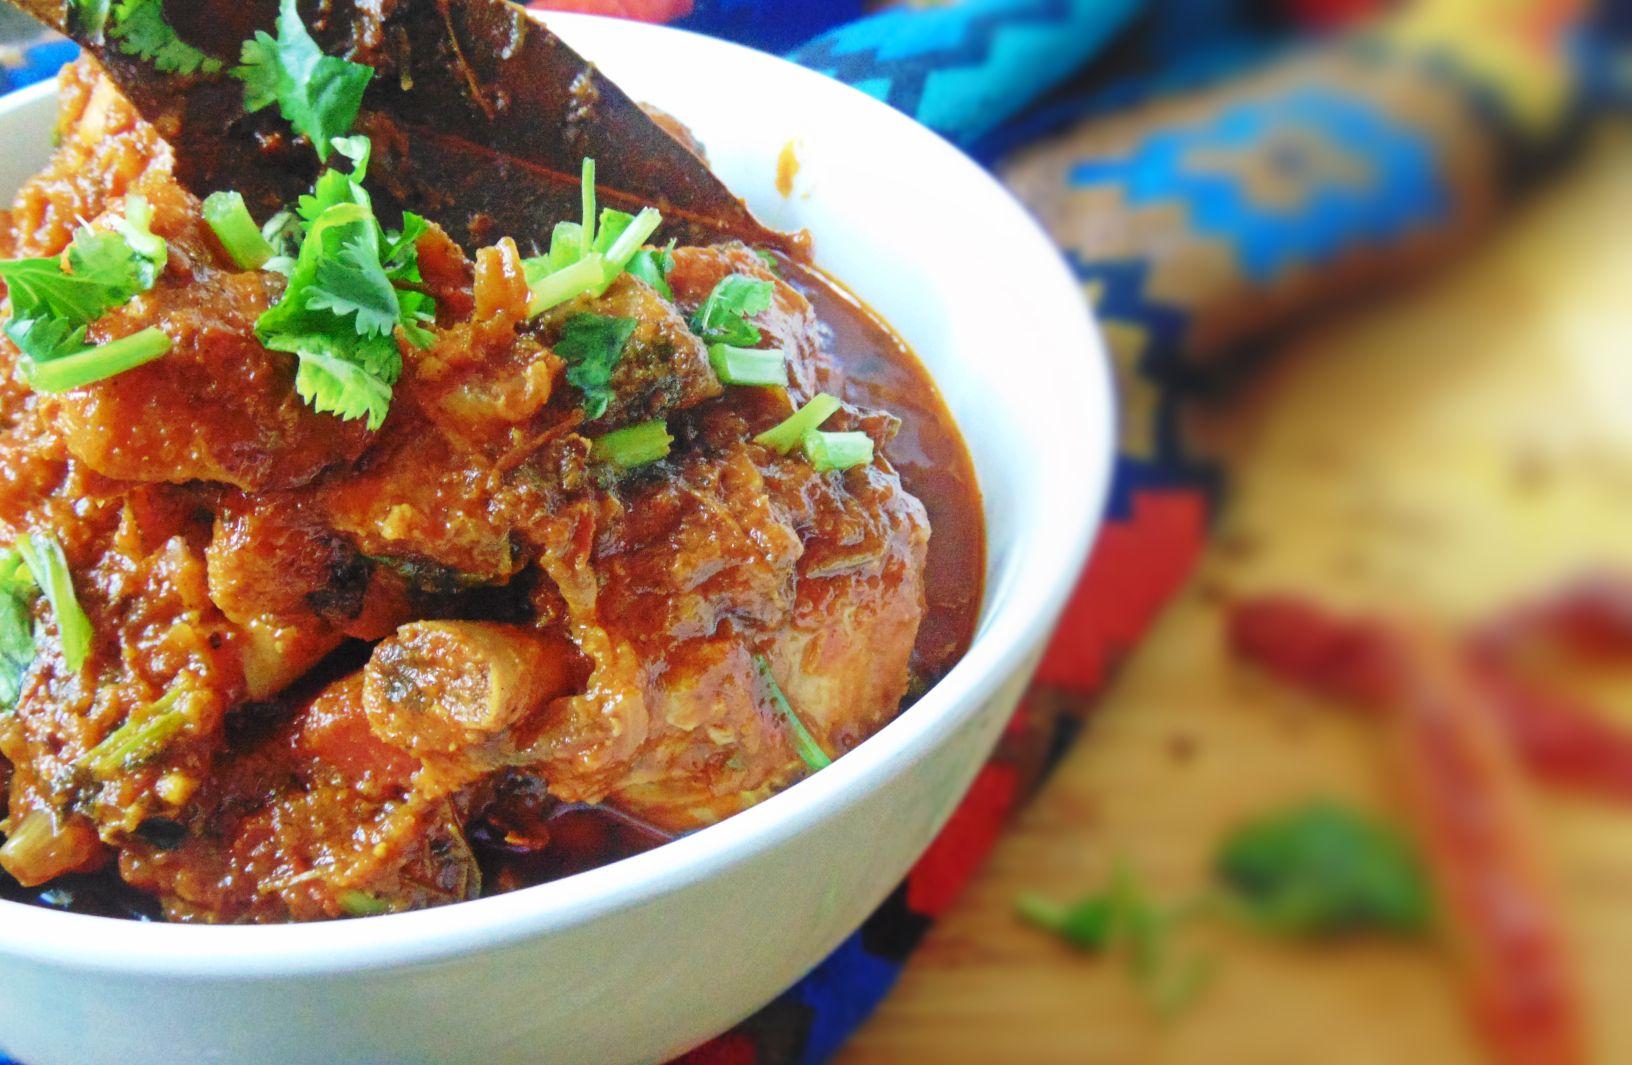 Easy Chicken Curry recipe Indian Style https://chukkiskitchen.wordpress.com/2017/02/24/chicken-curry-how-to-make-chicken-curry-indian-style/